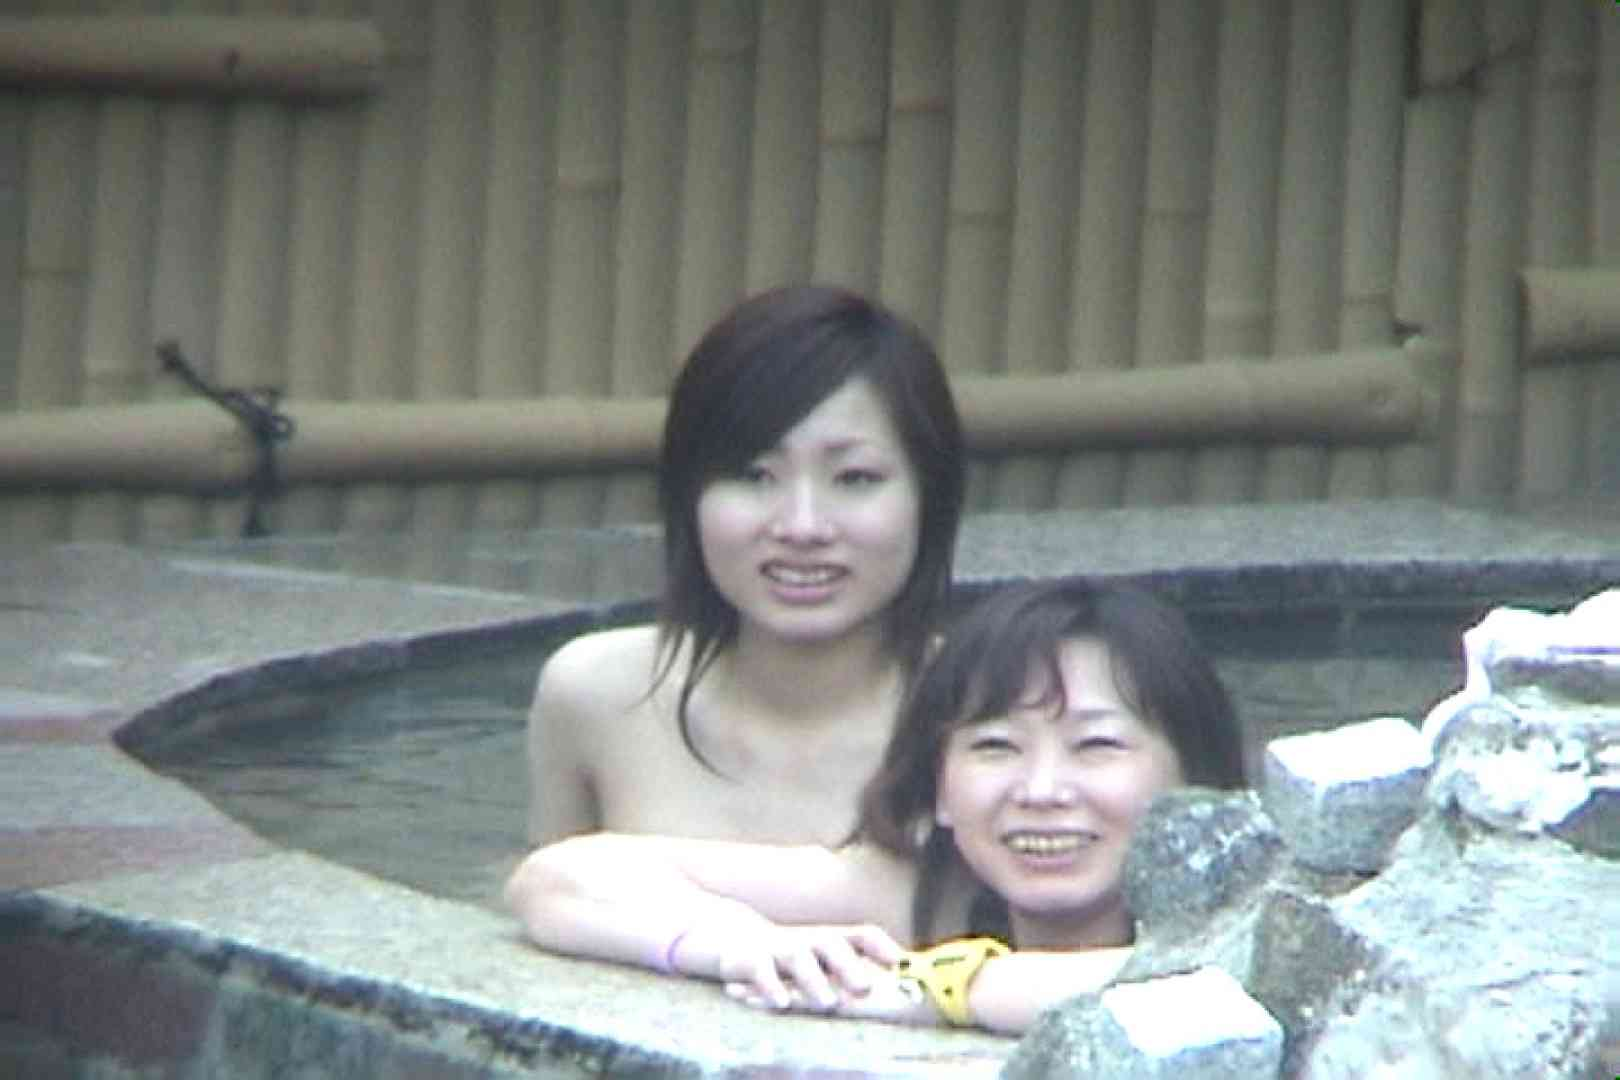 Aquaな露天風呂Vol.58【VIP限定】 0  71連発 26